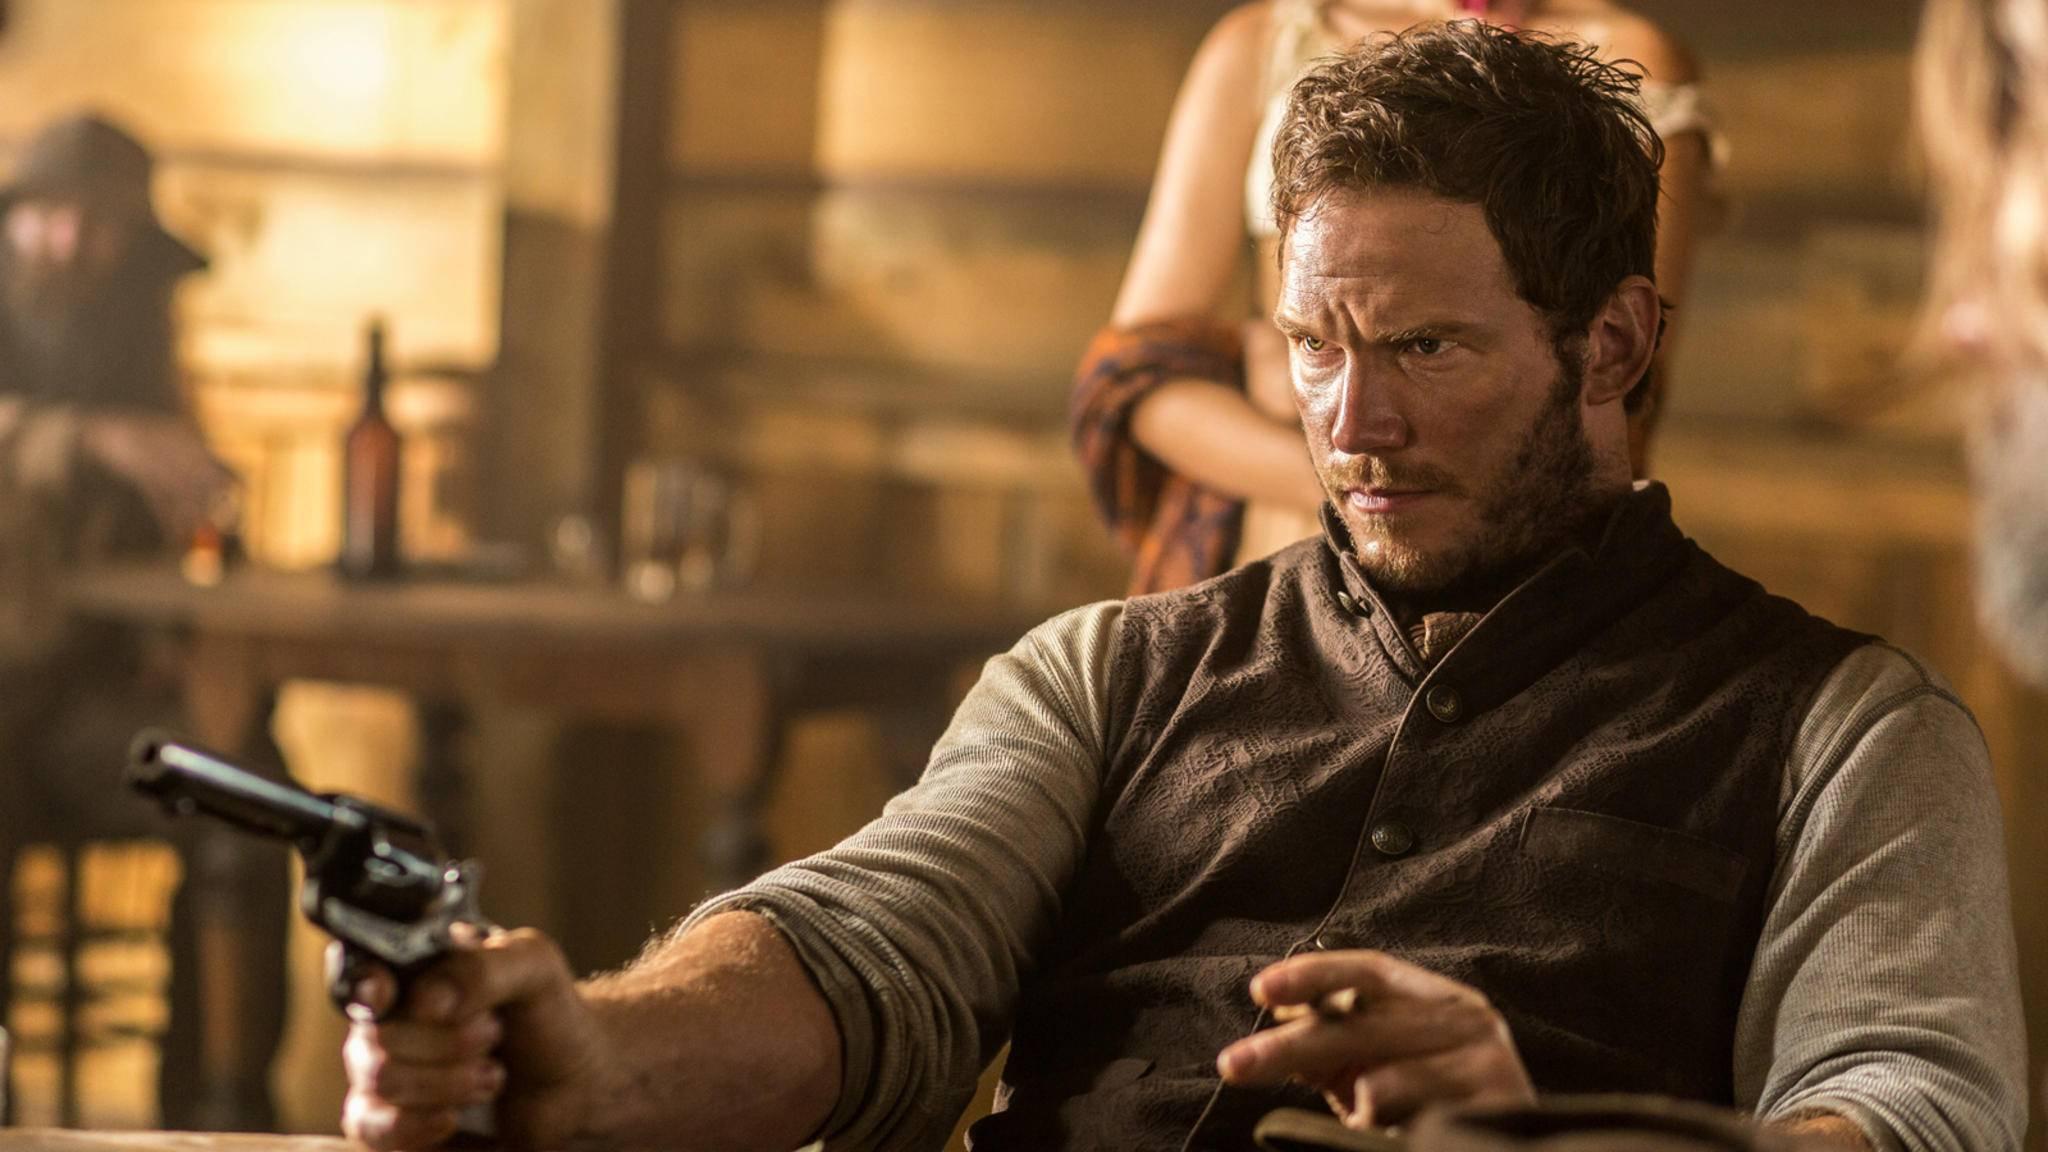 Chris Pratt Filme und Fernsehsendungen: 10 Highlights mit dem Avengers-Star